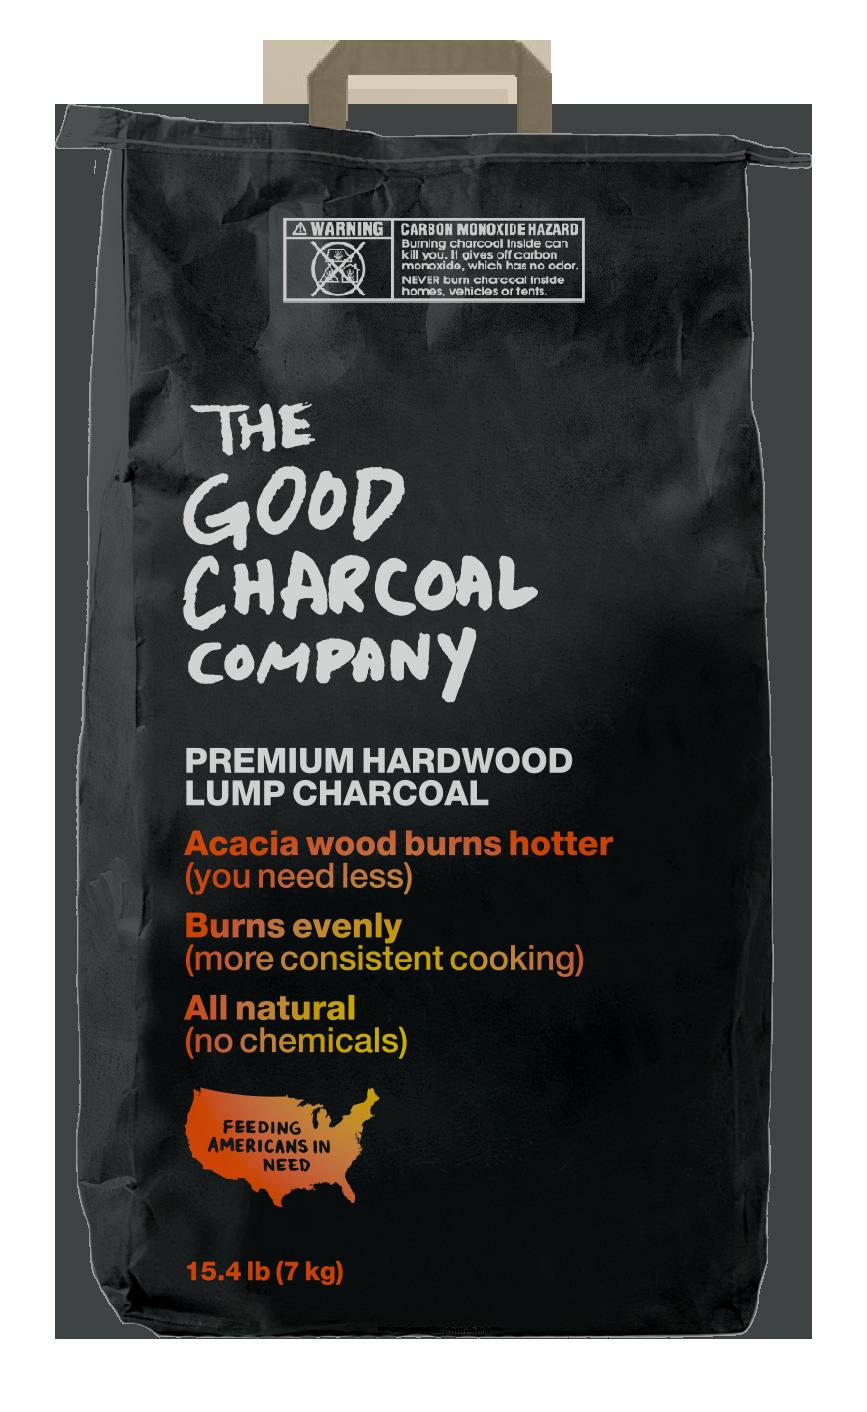 Premium Hardwood Lump Charcoal